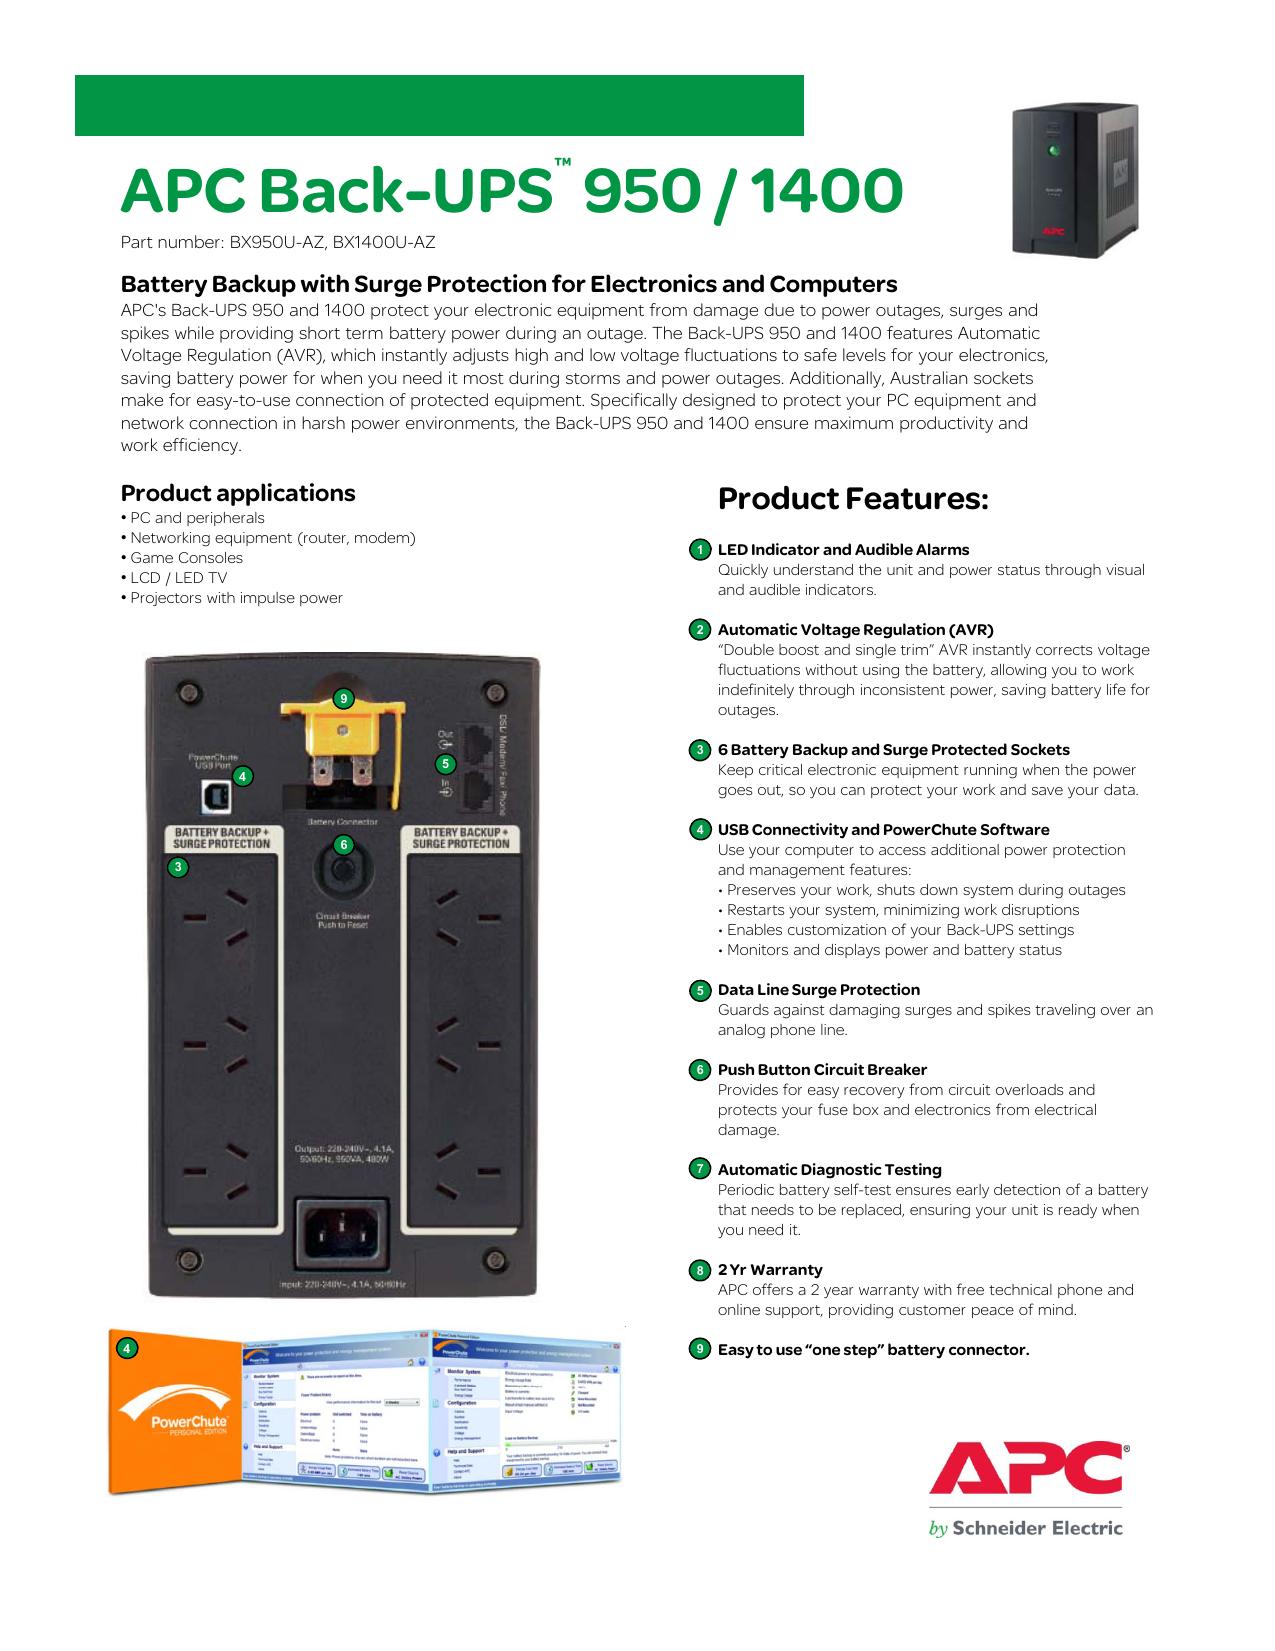 Apc Back Ups 950 1400 Push Button Fuse Box